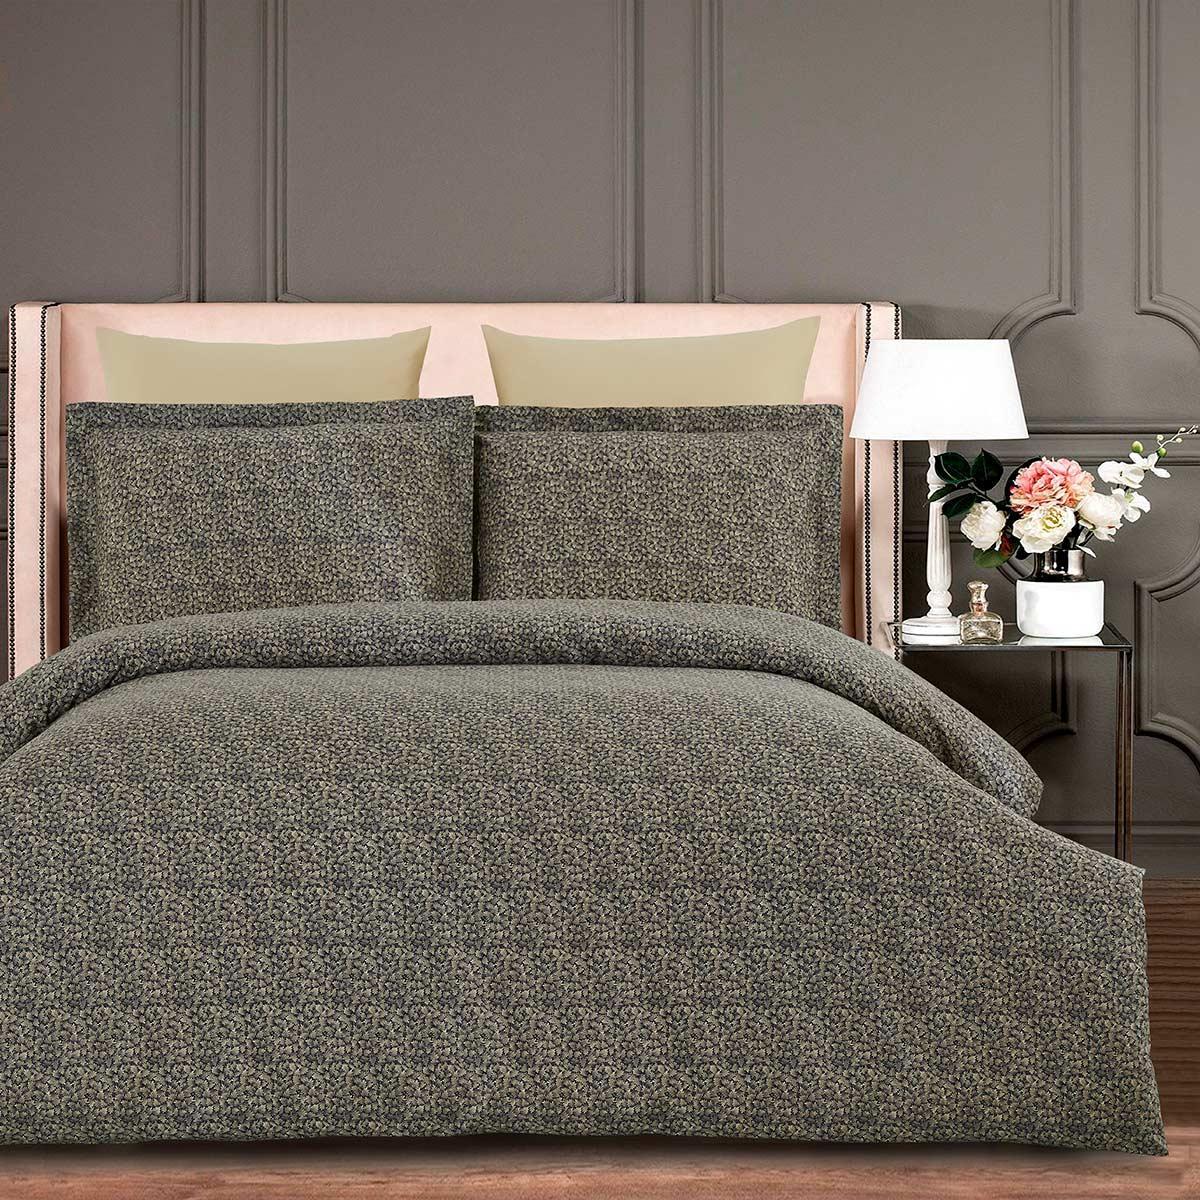 Комплект постельного белья 160х220 см Сатин Kilan Alamode Arya AR-TR1005551